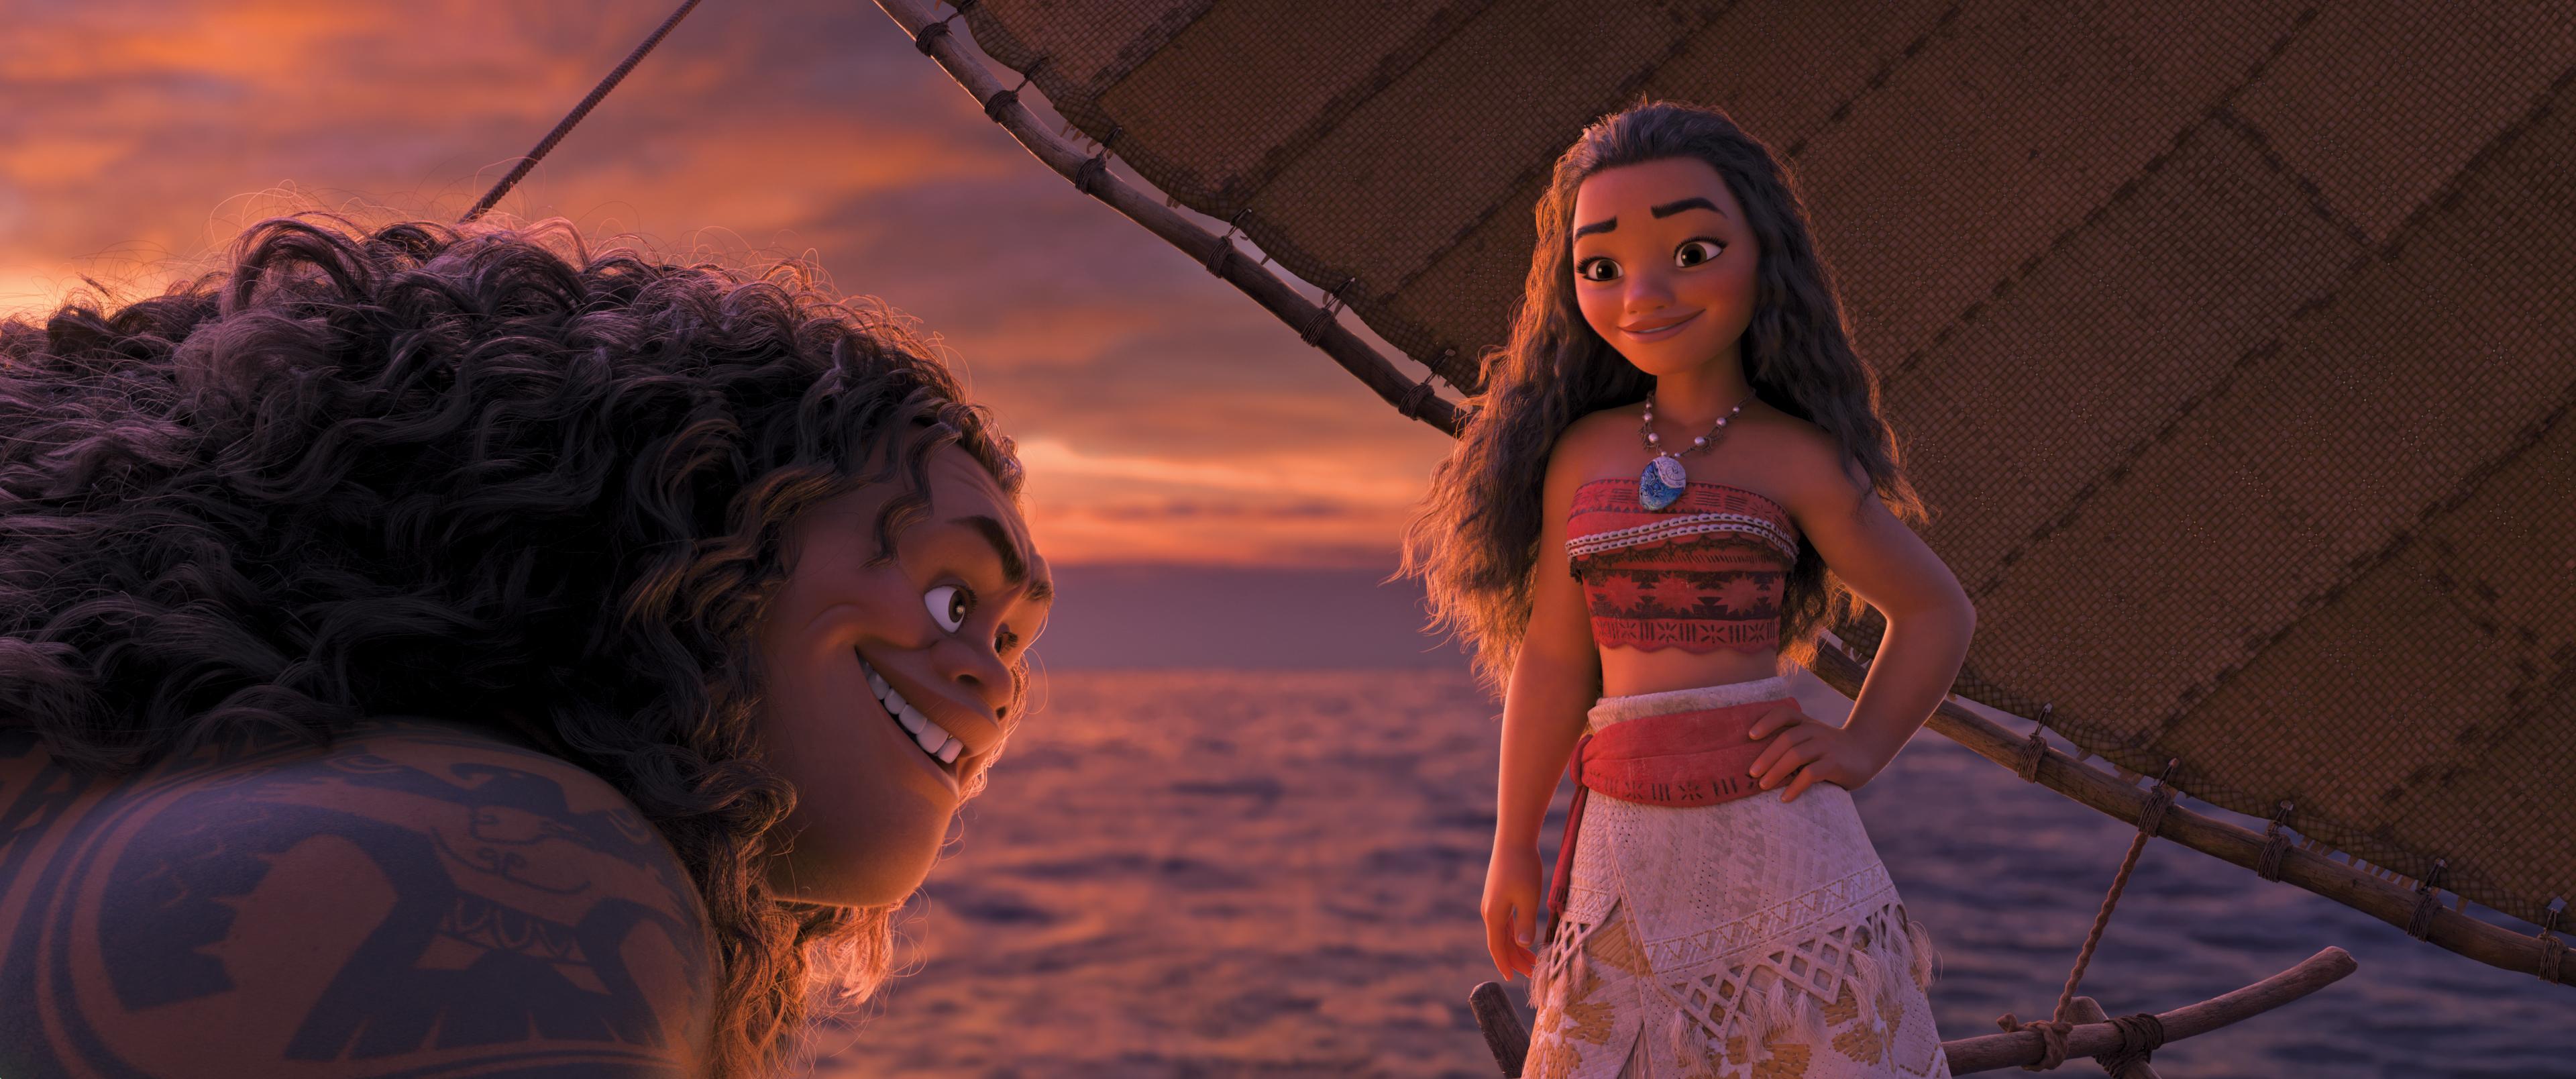 Hawaiianische Mythen : Disneys Vaiana